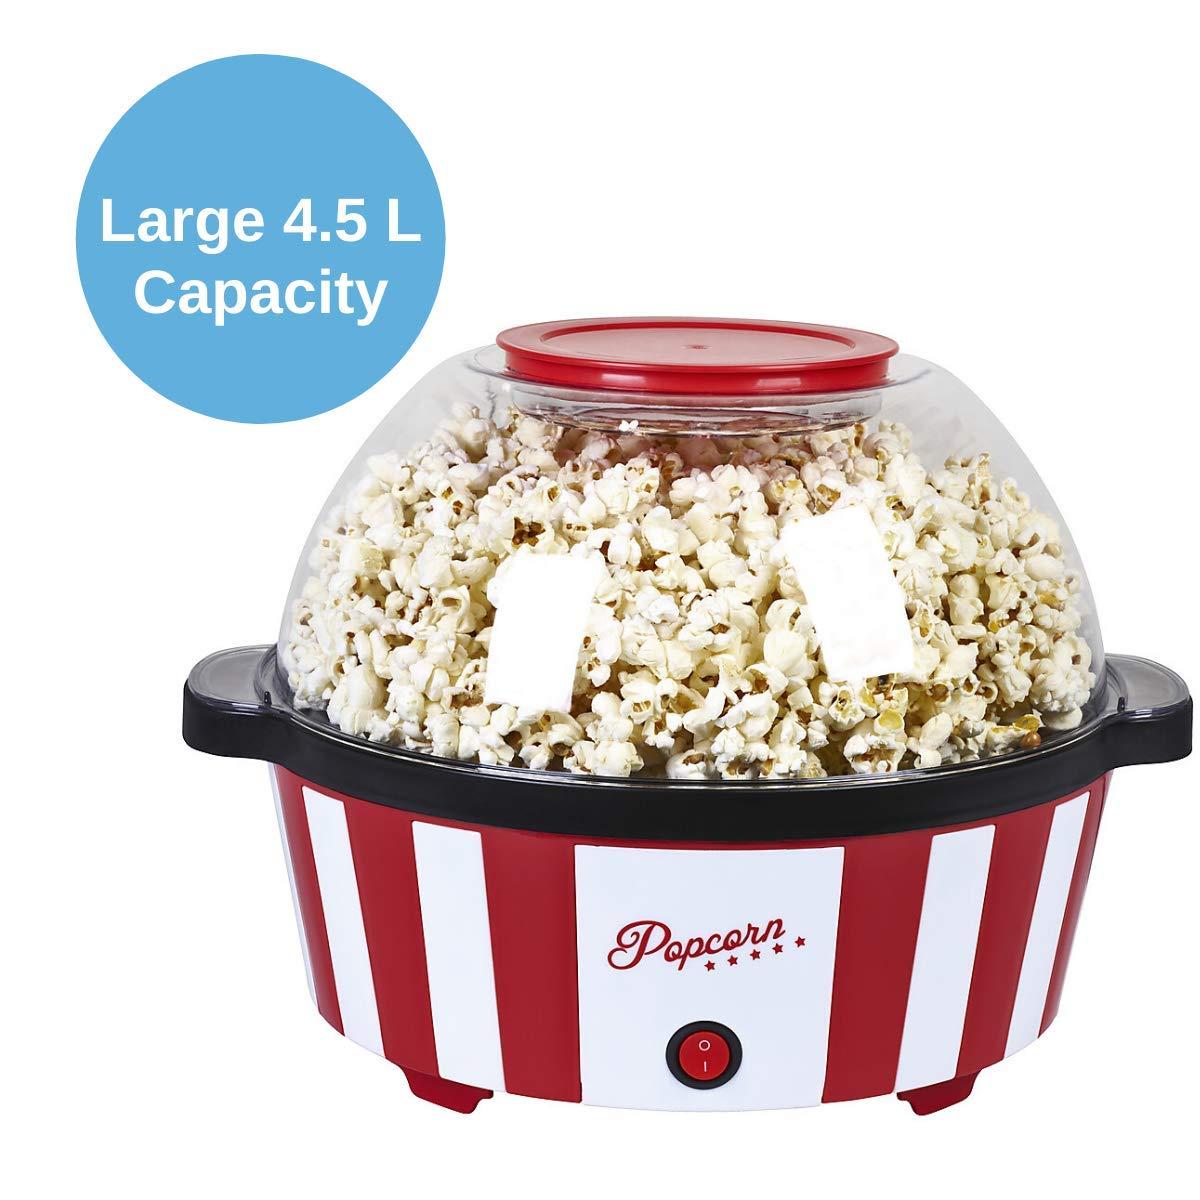 popcorn maker clas ohlson